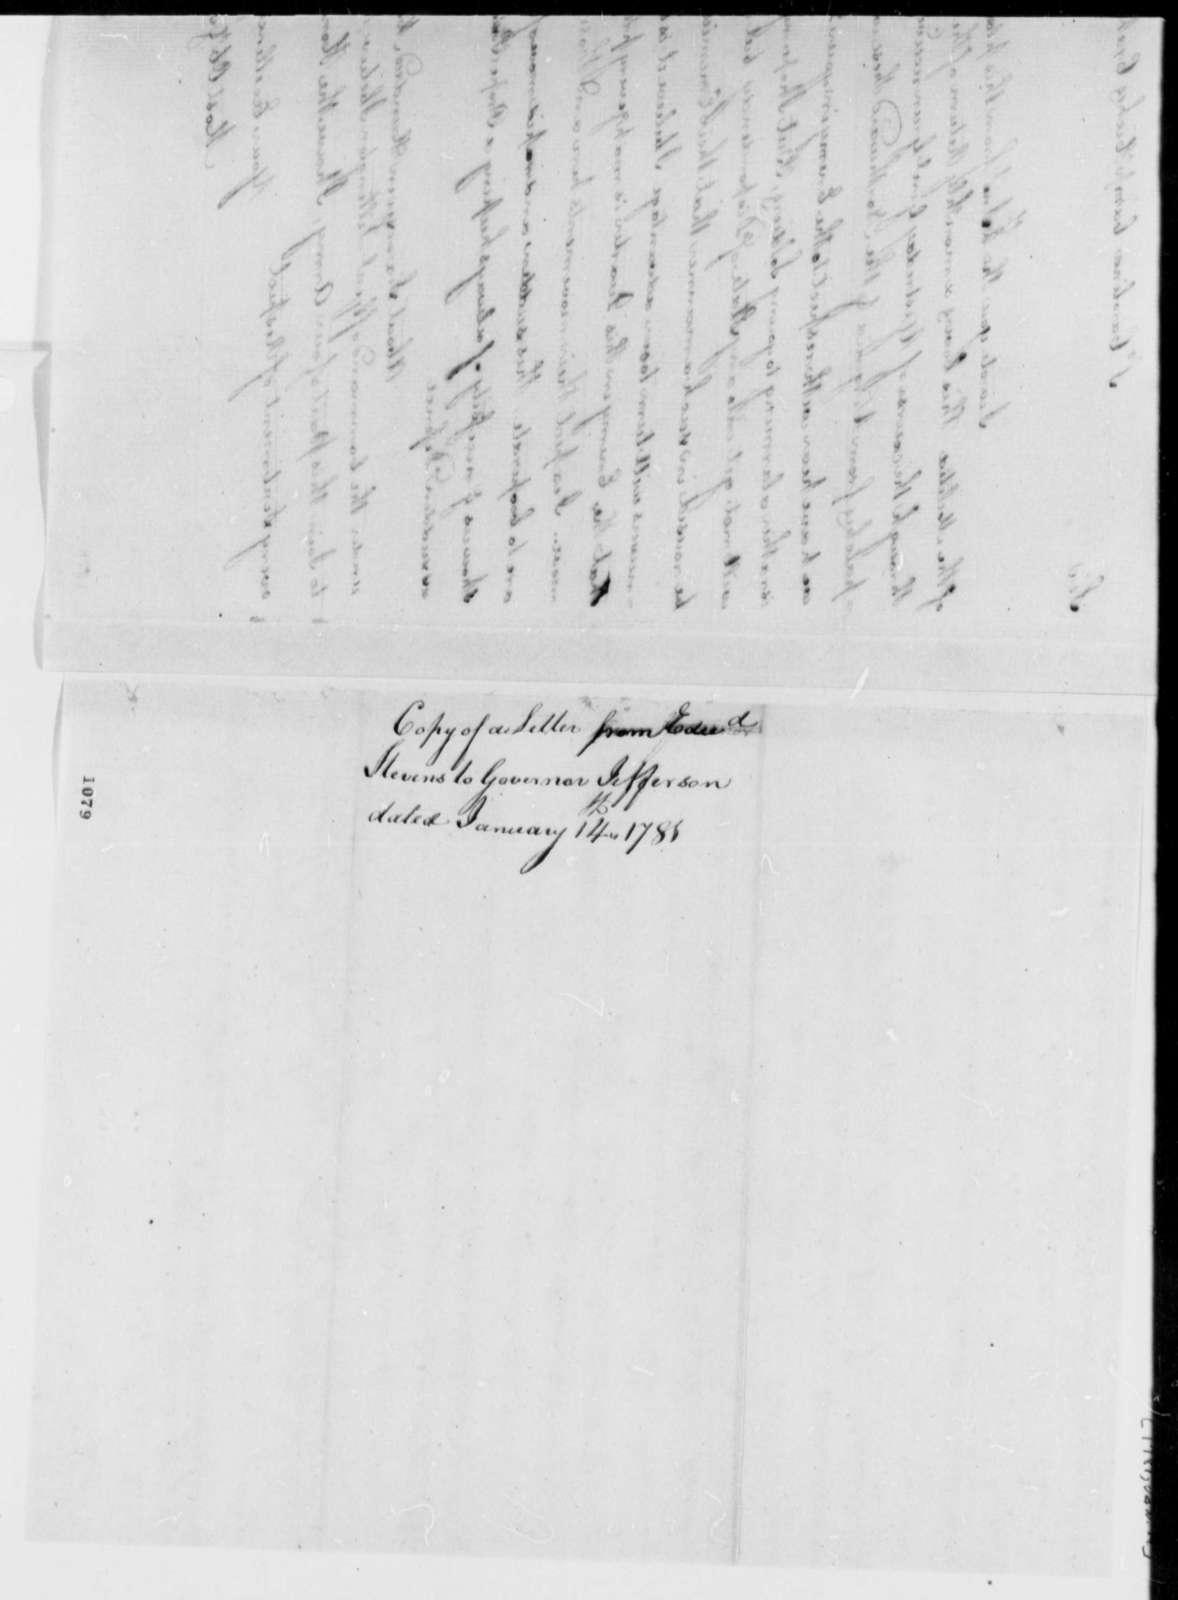 Edward Stevens to Thomas Jefferson, January 14, 1781